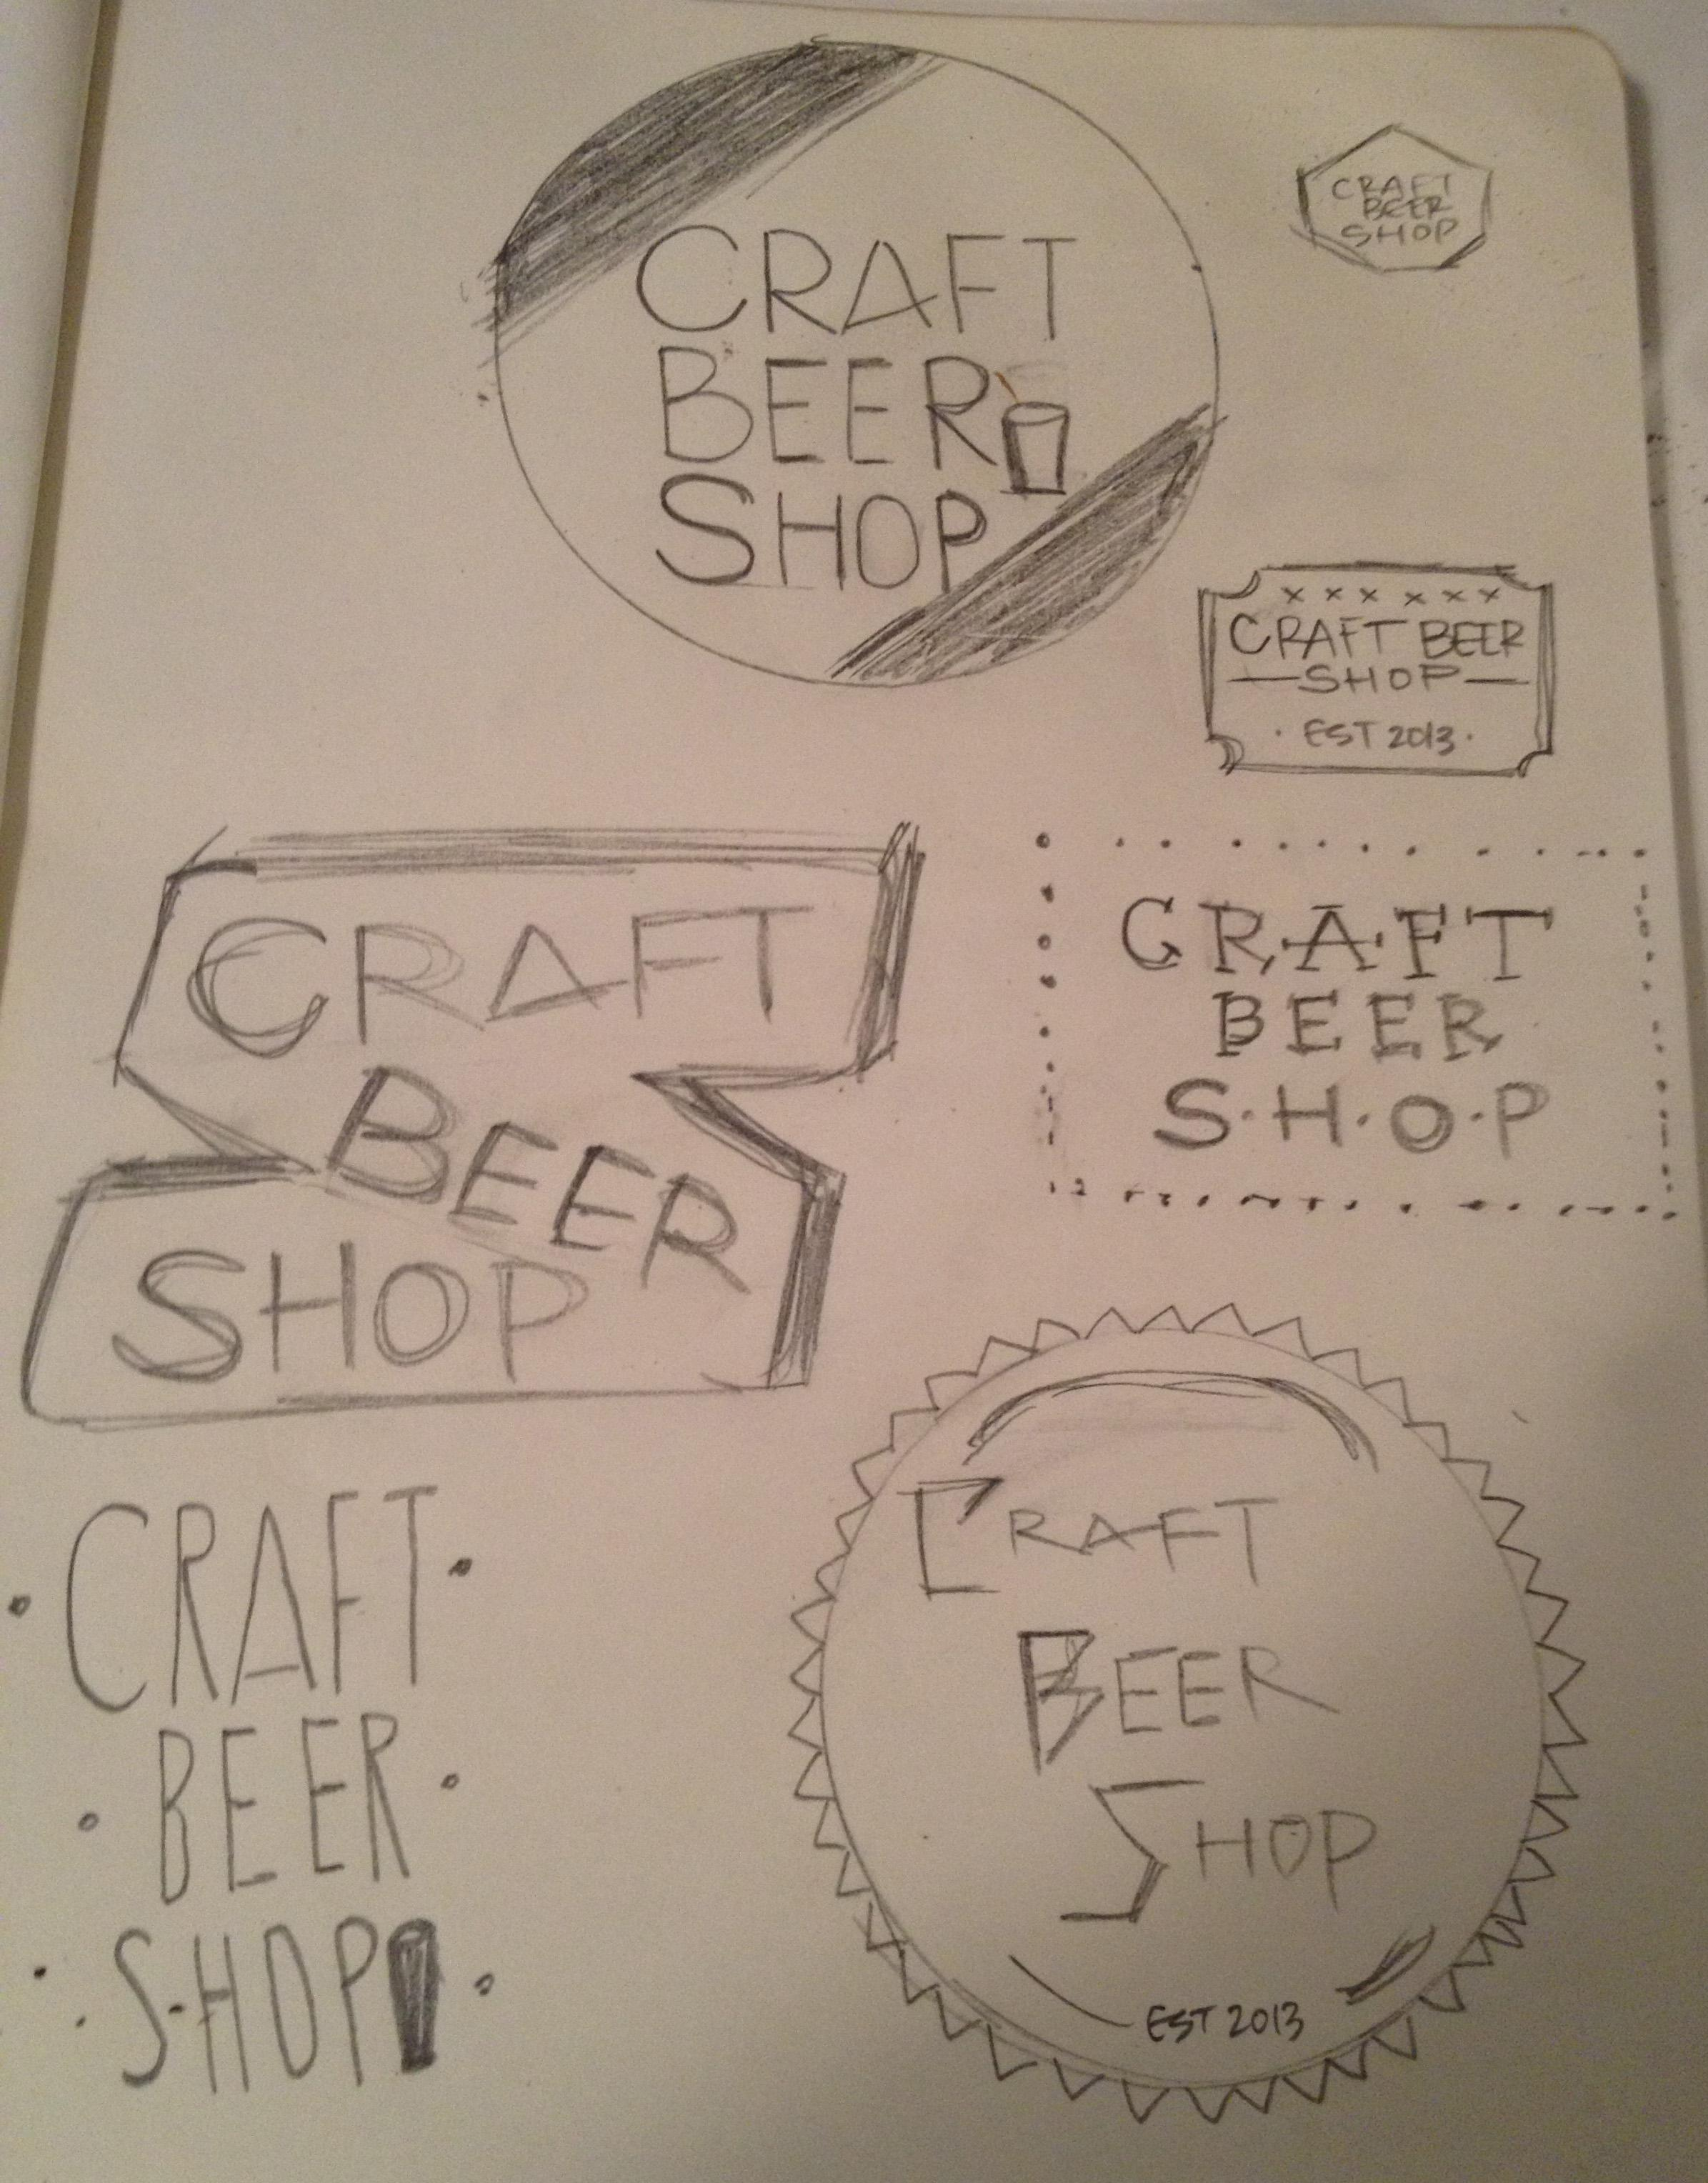 CraftBeerShop - image 2 - student project